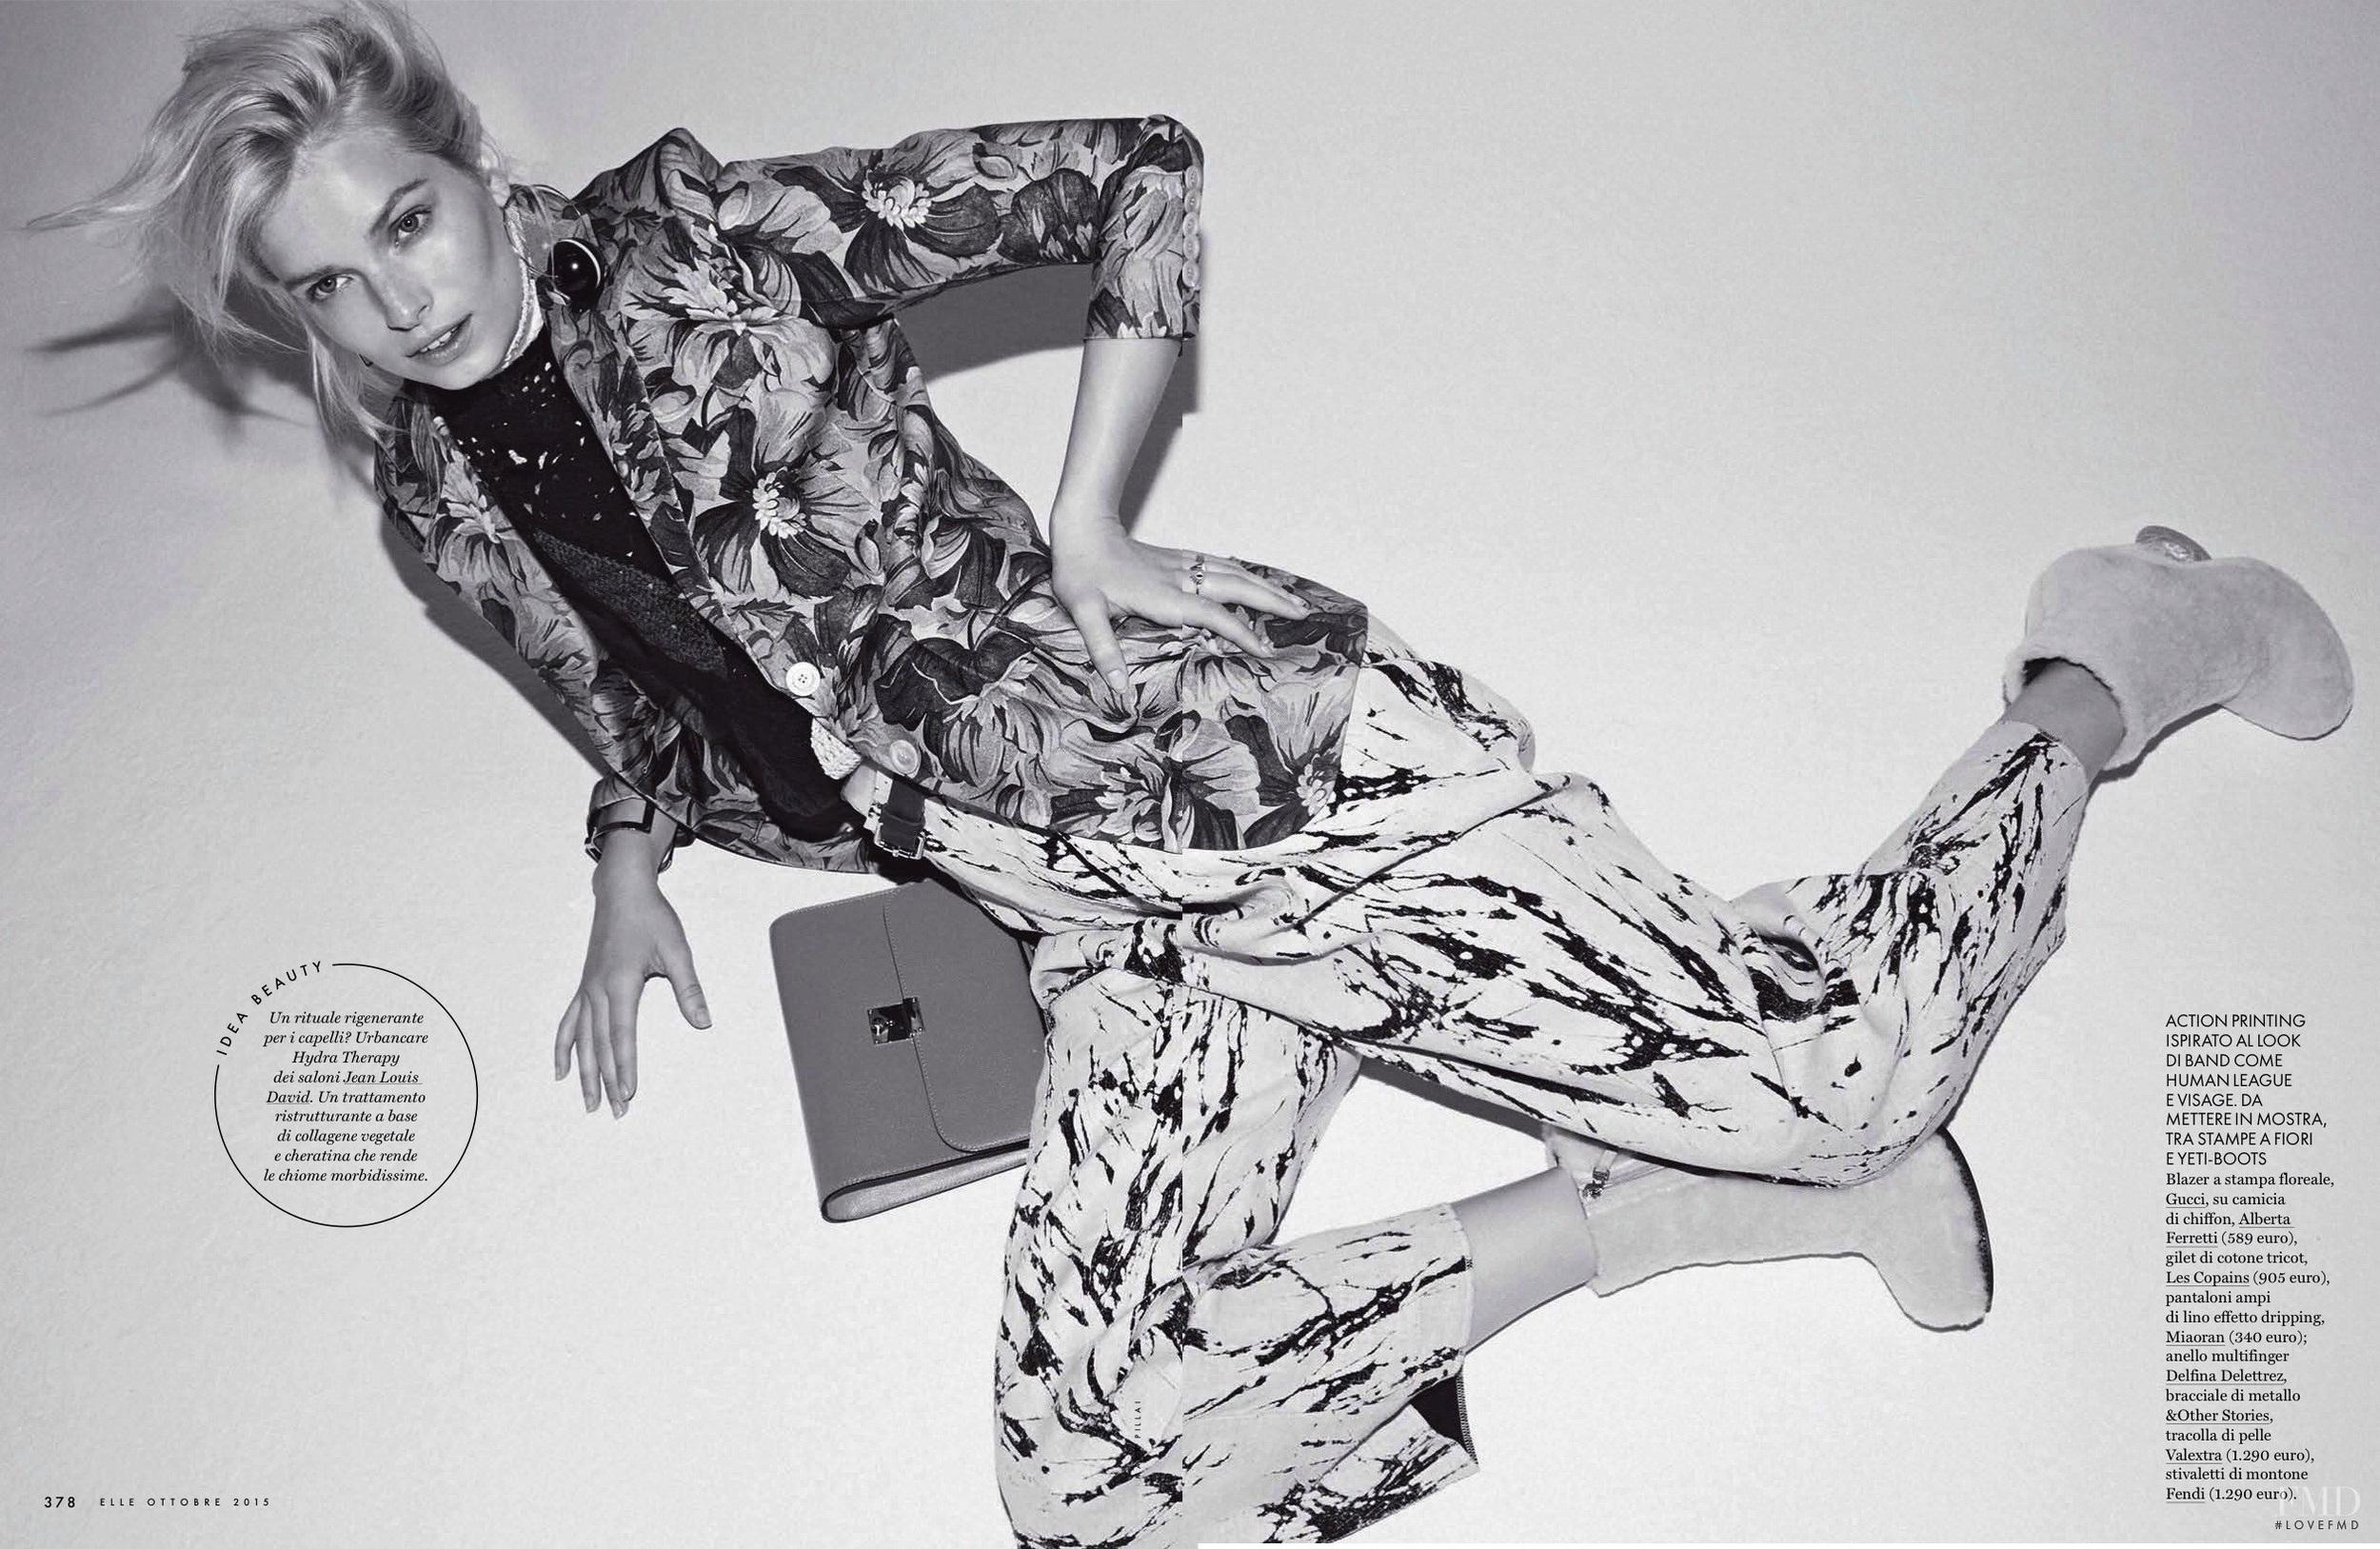 Bree Smith for Elle Italia by Mark Pillai |  Source